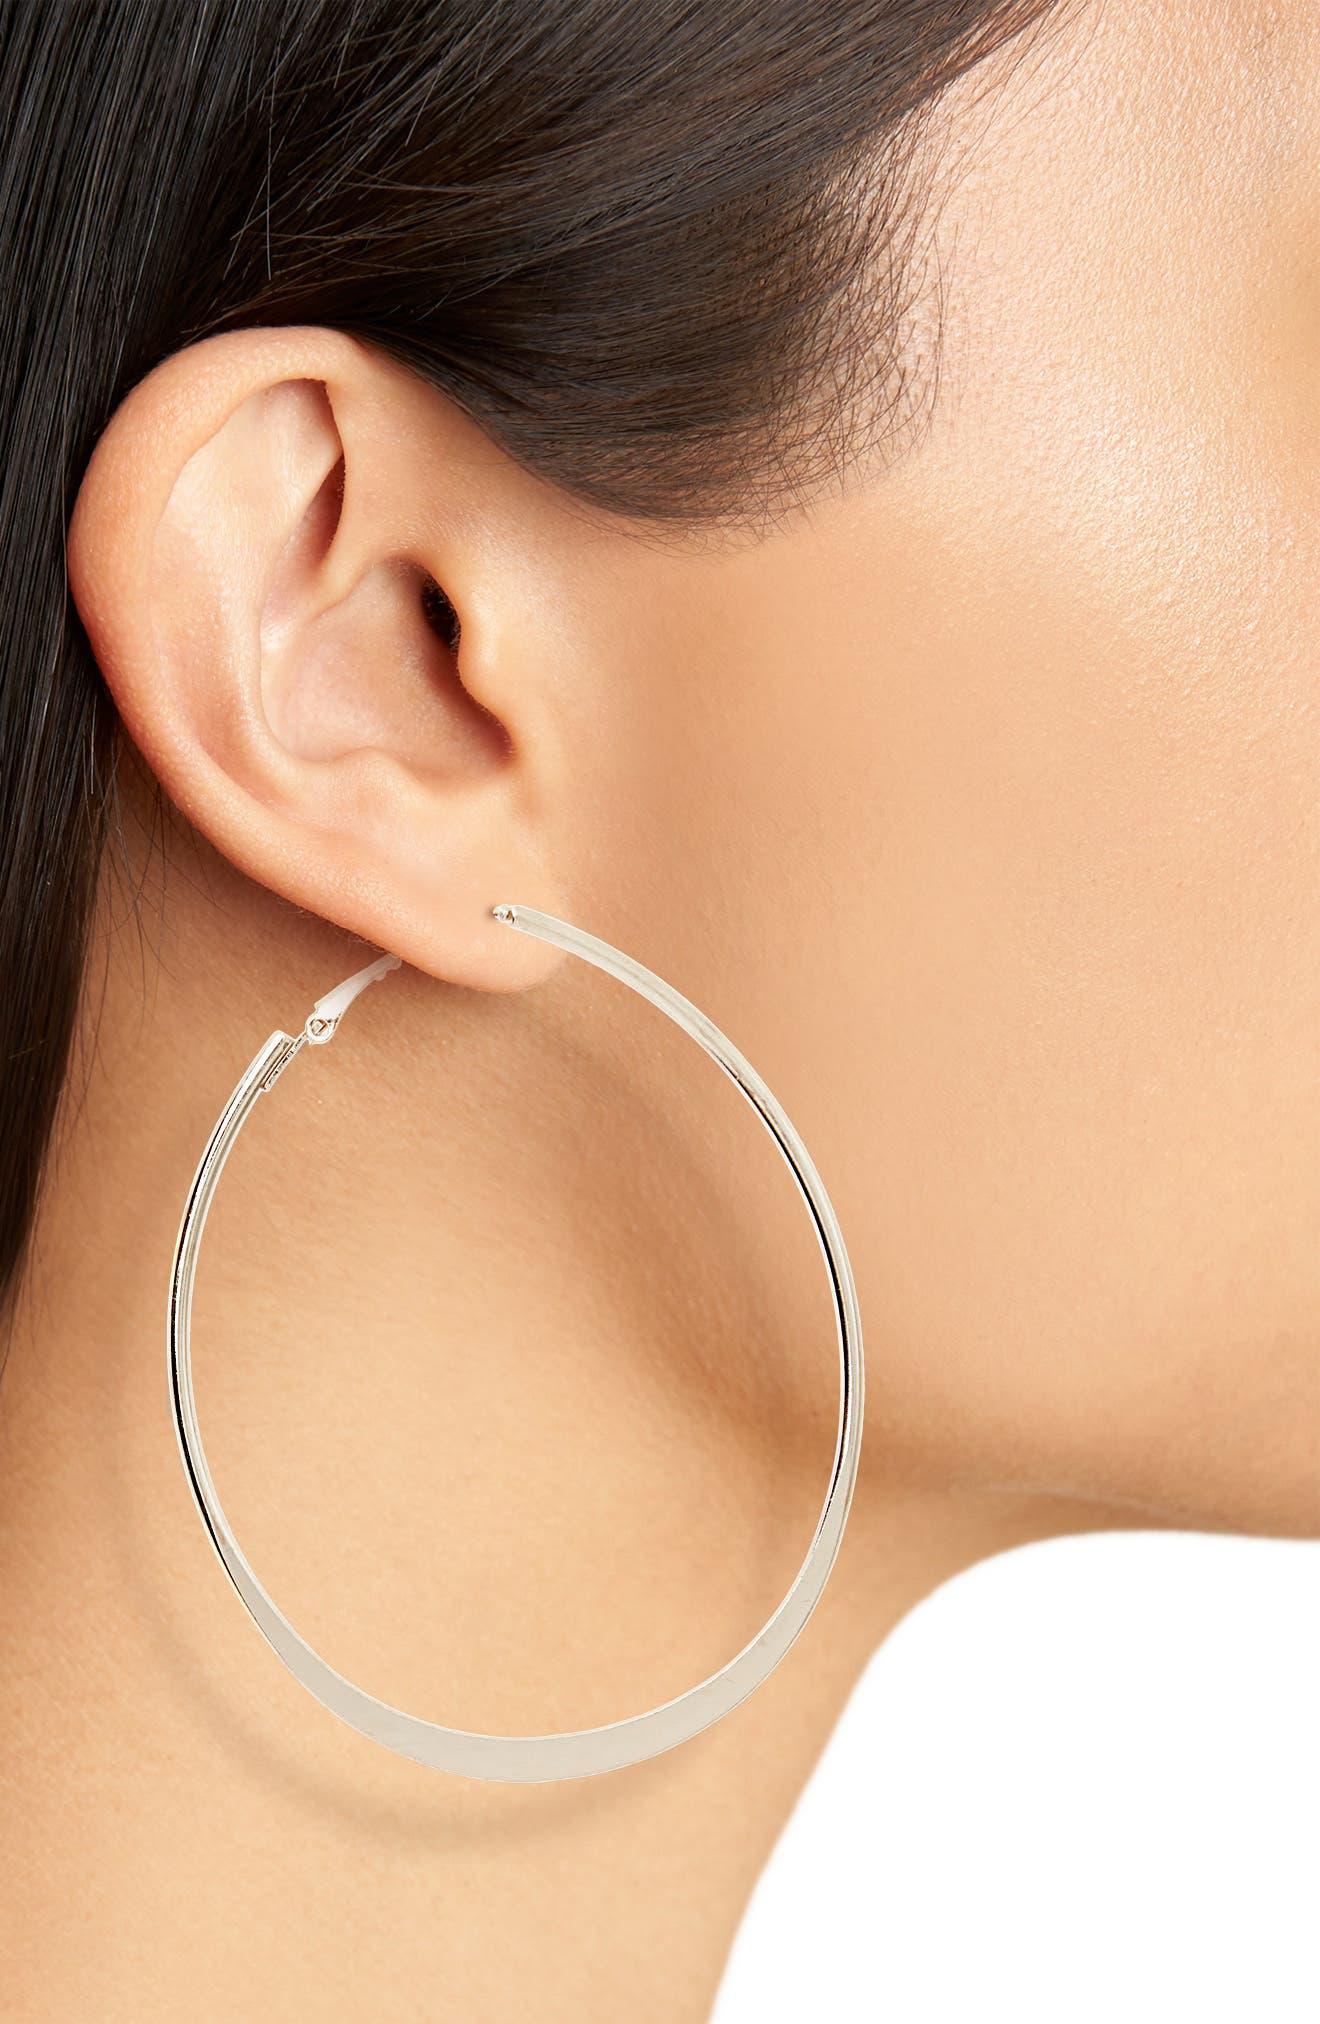 Oval Hoop Earrings,                             Alternate thumbnail 3, color,